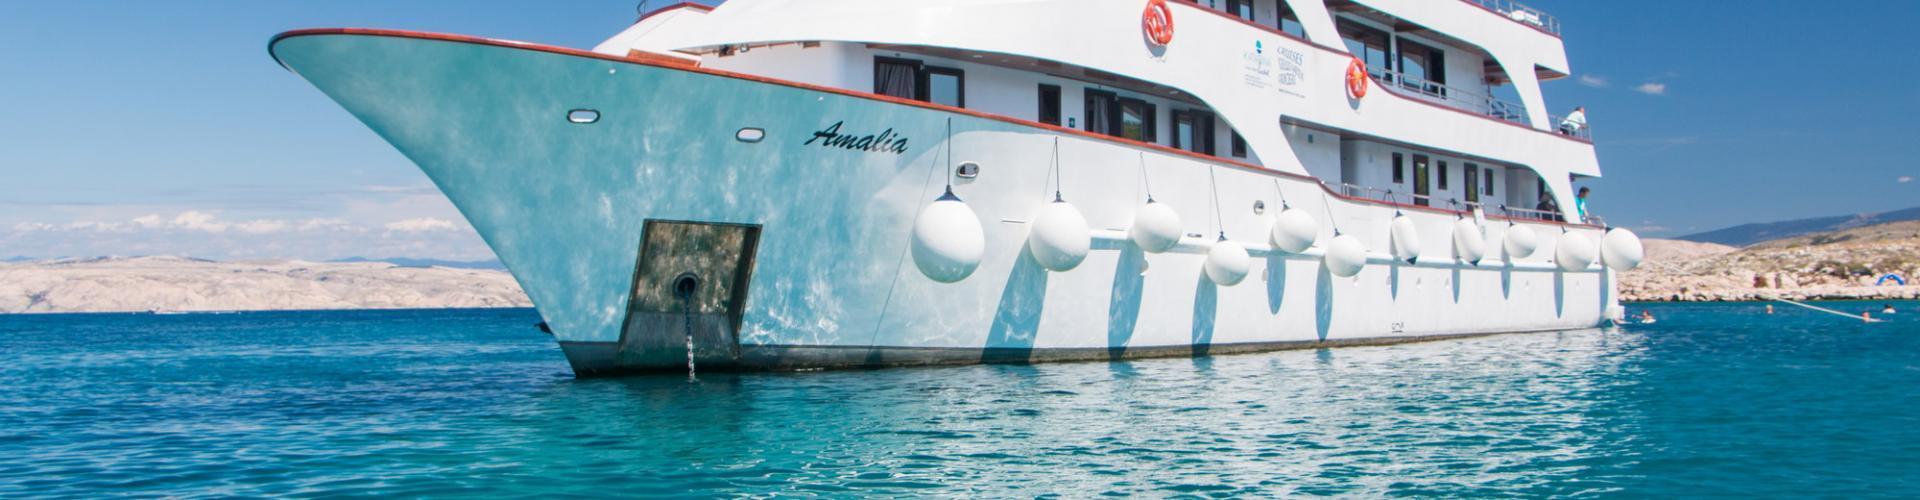 Premium Superior cruiser MV Amalia- motor yacht